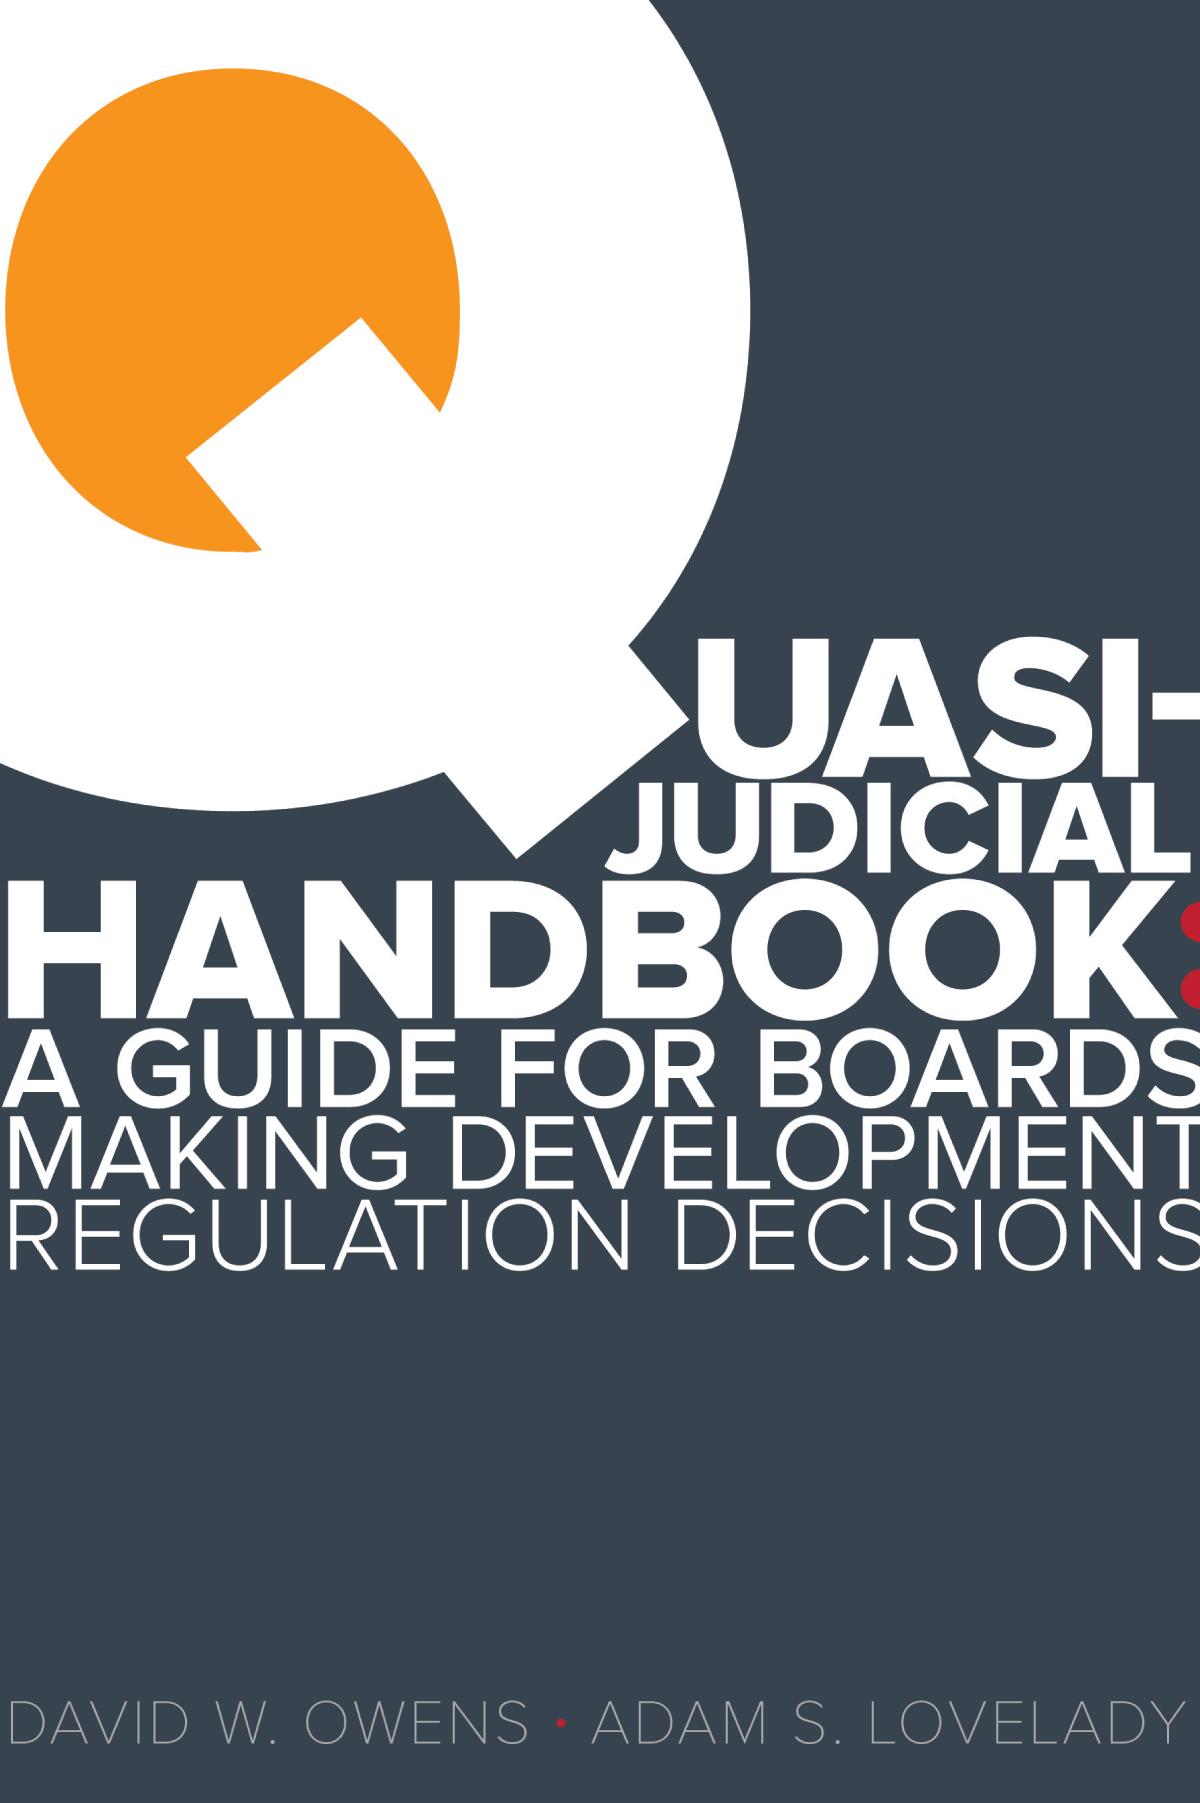 Quasi Judicial Handbook Cover Image